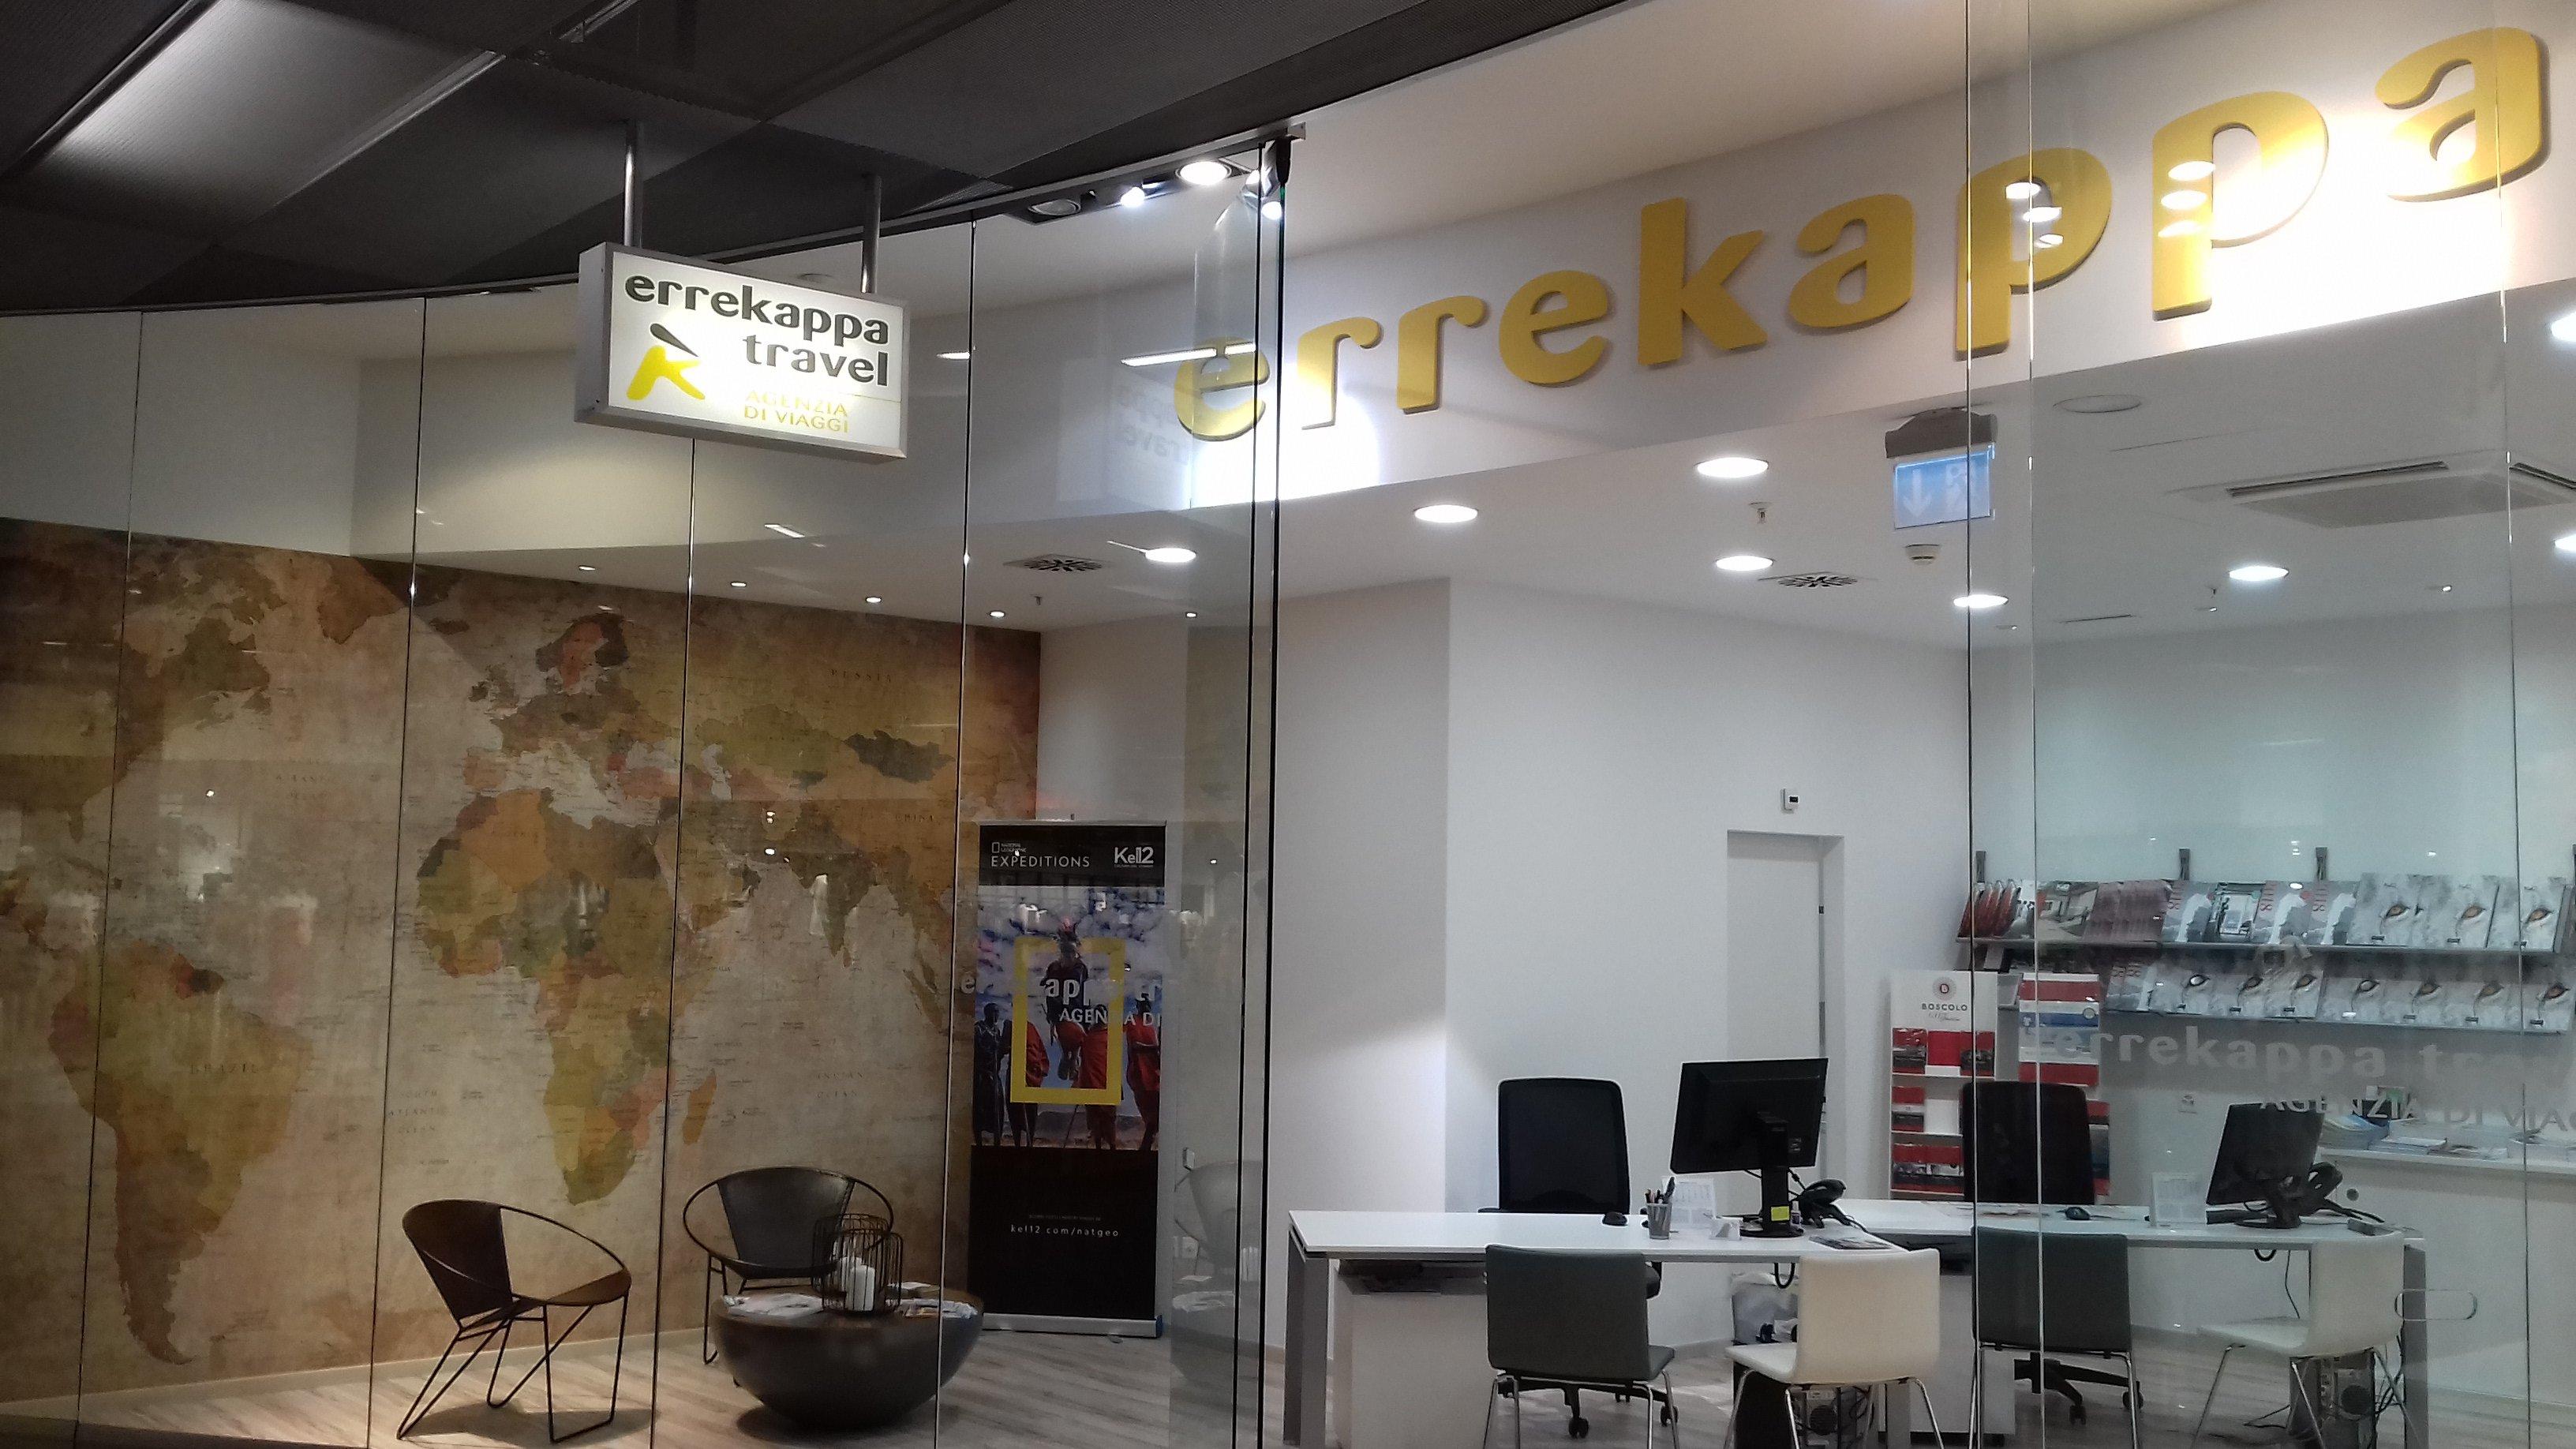 Errekappa Travel & Tourism